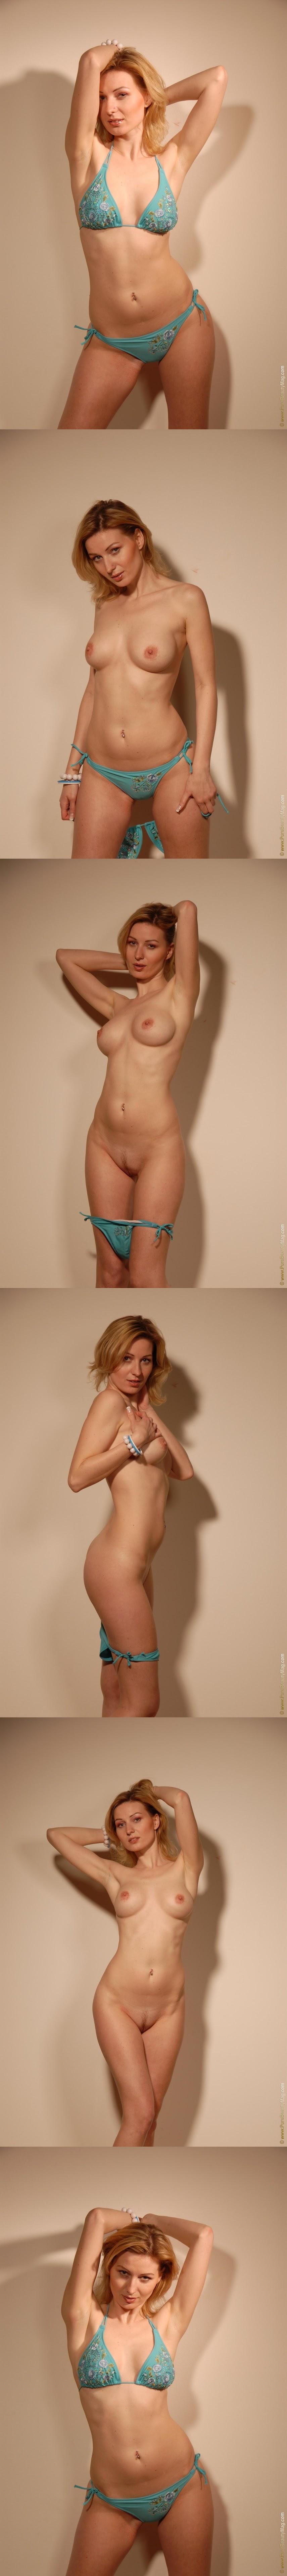 PureBeautyMag PBM  - 2007-04-30 - #s348778 - Ivana J - Depths Desire - 3872px